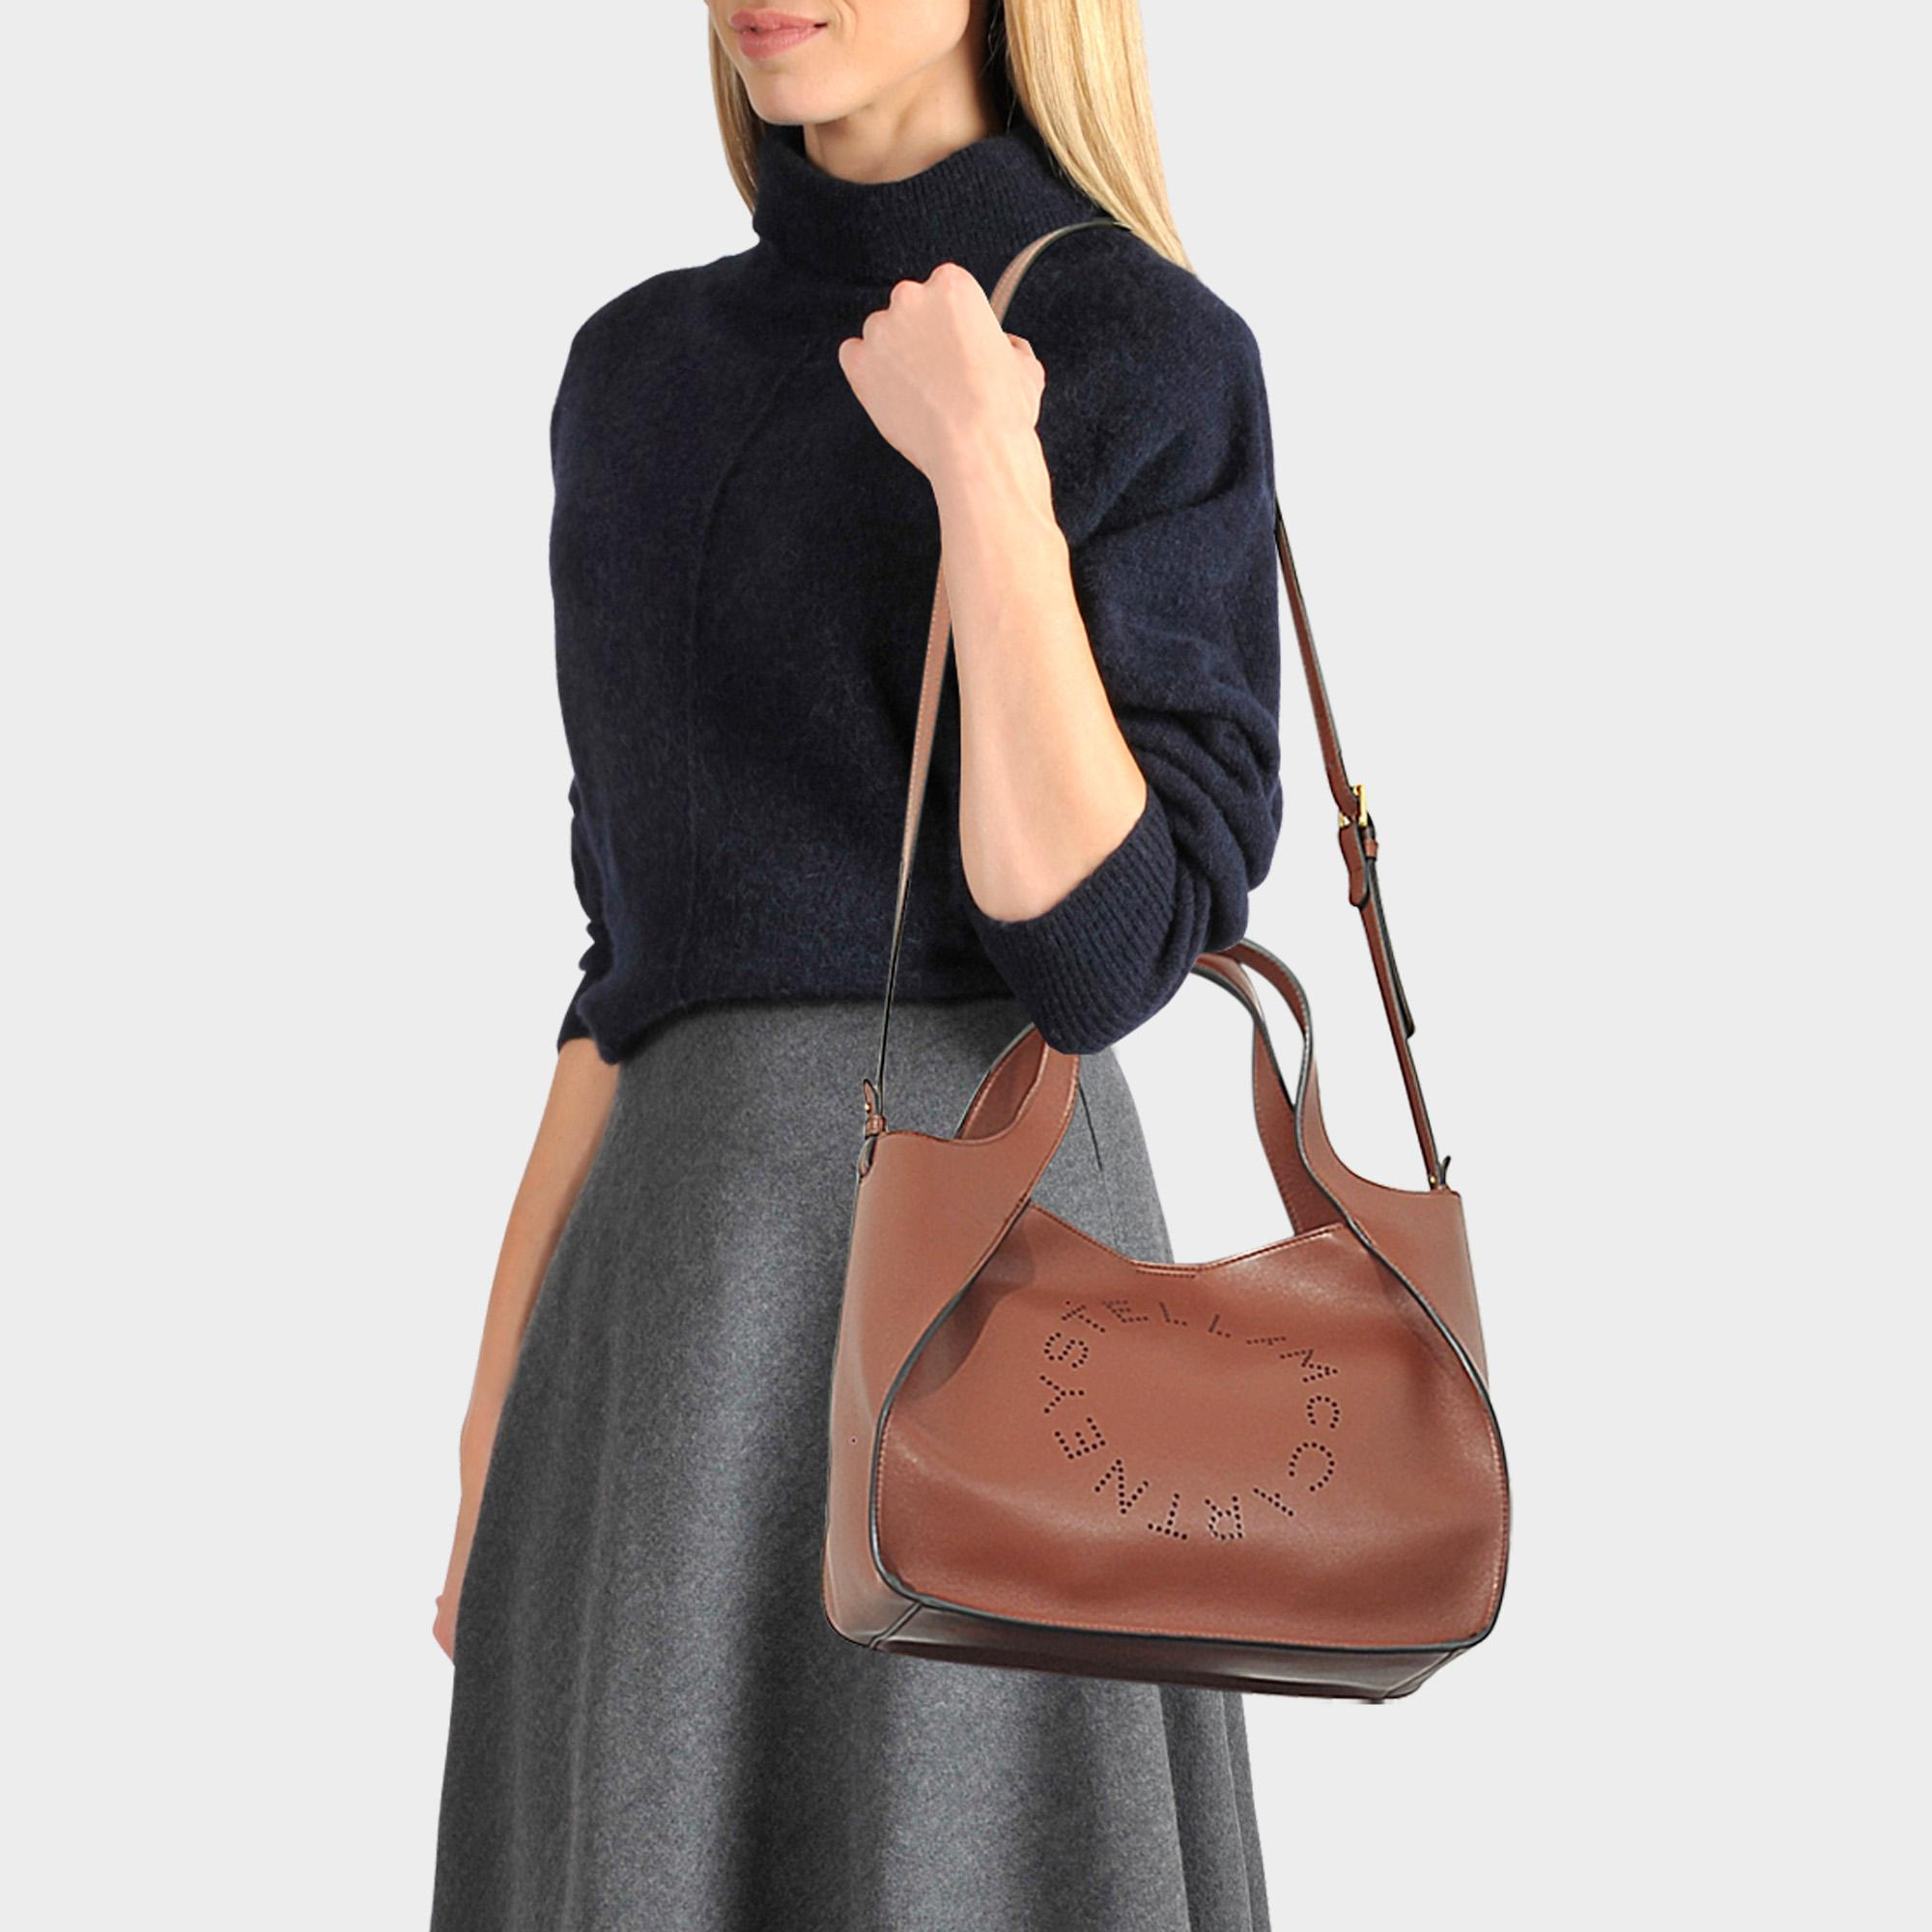 Lyst - Stella McCartney Alter Nappa Stella Logo Bag In Brown ... 9b73236854c68